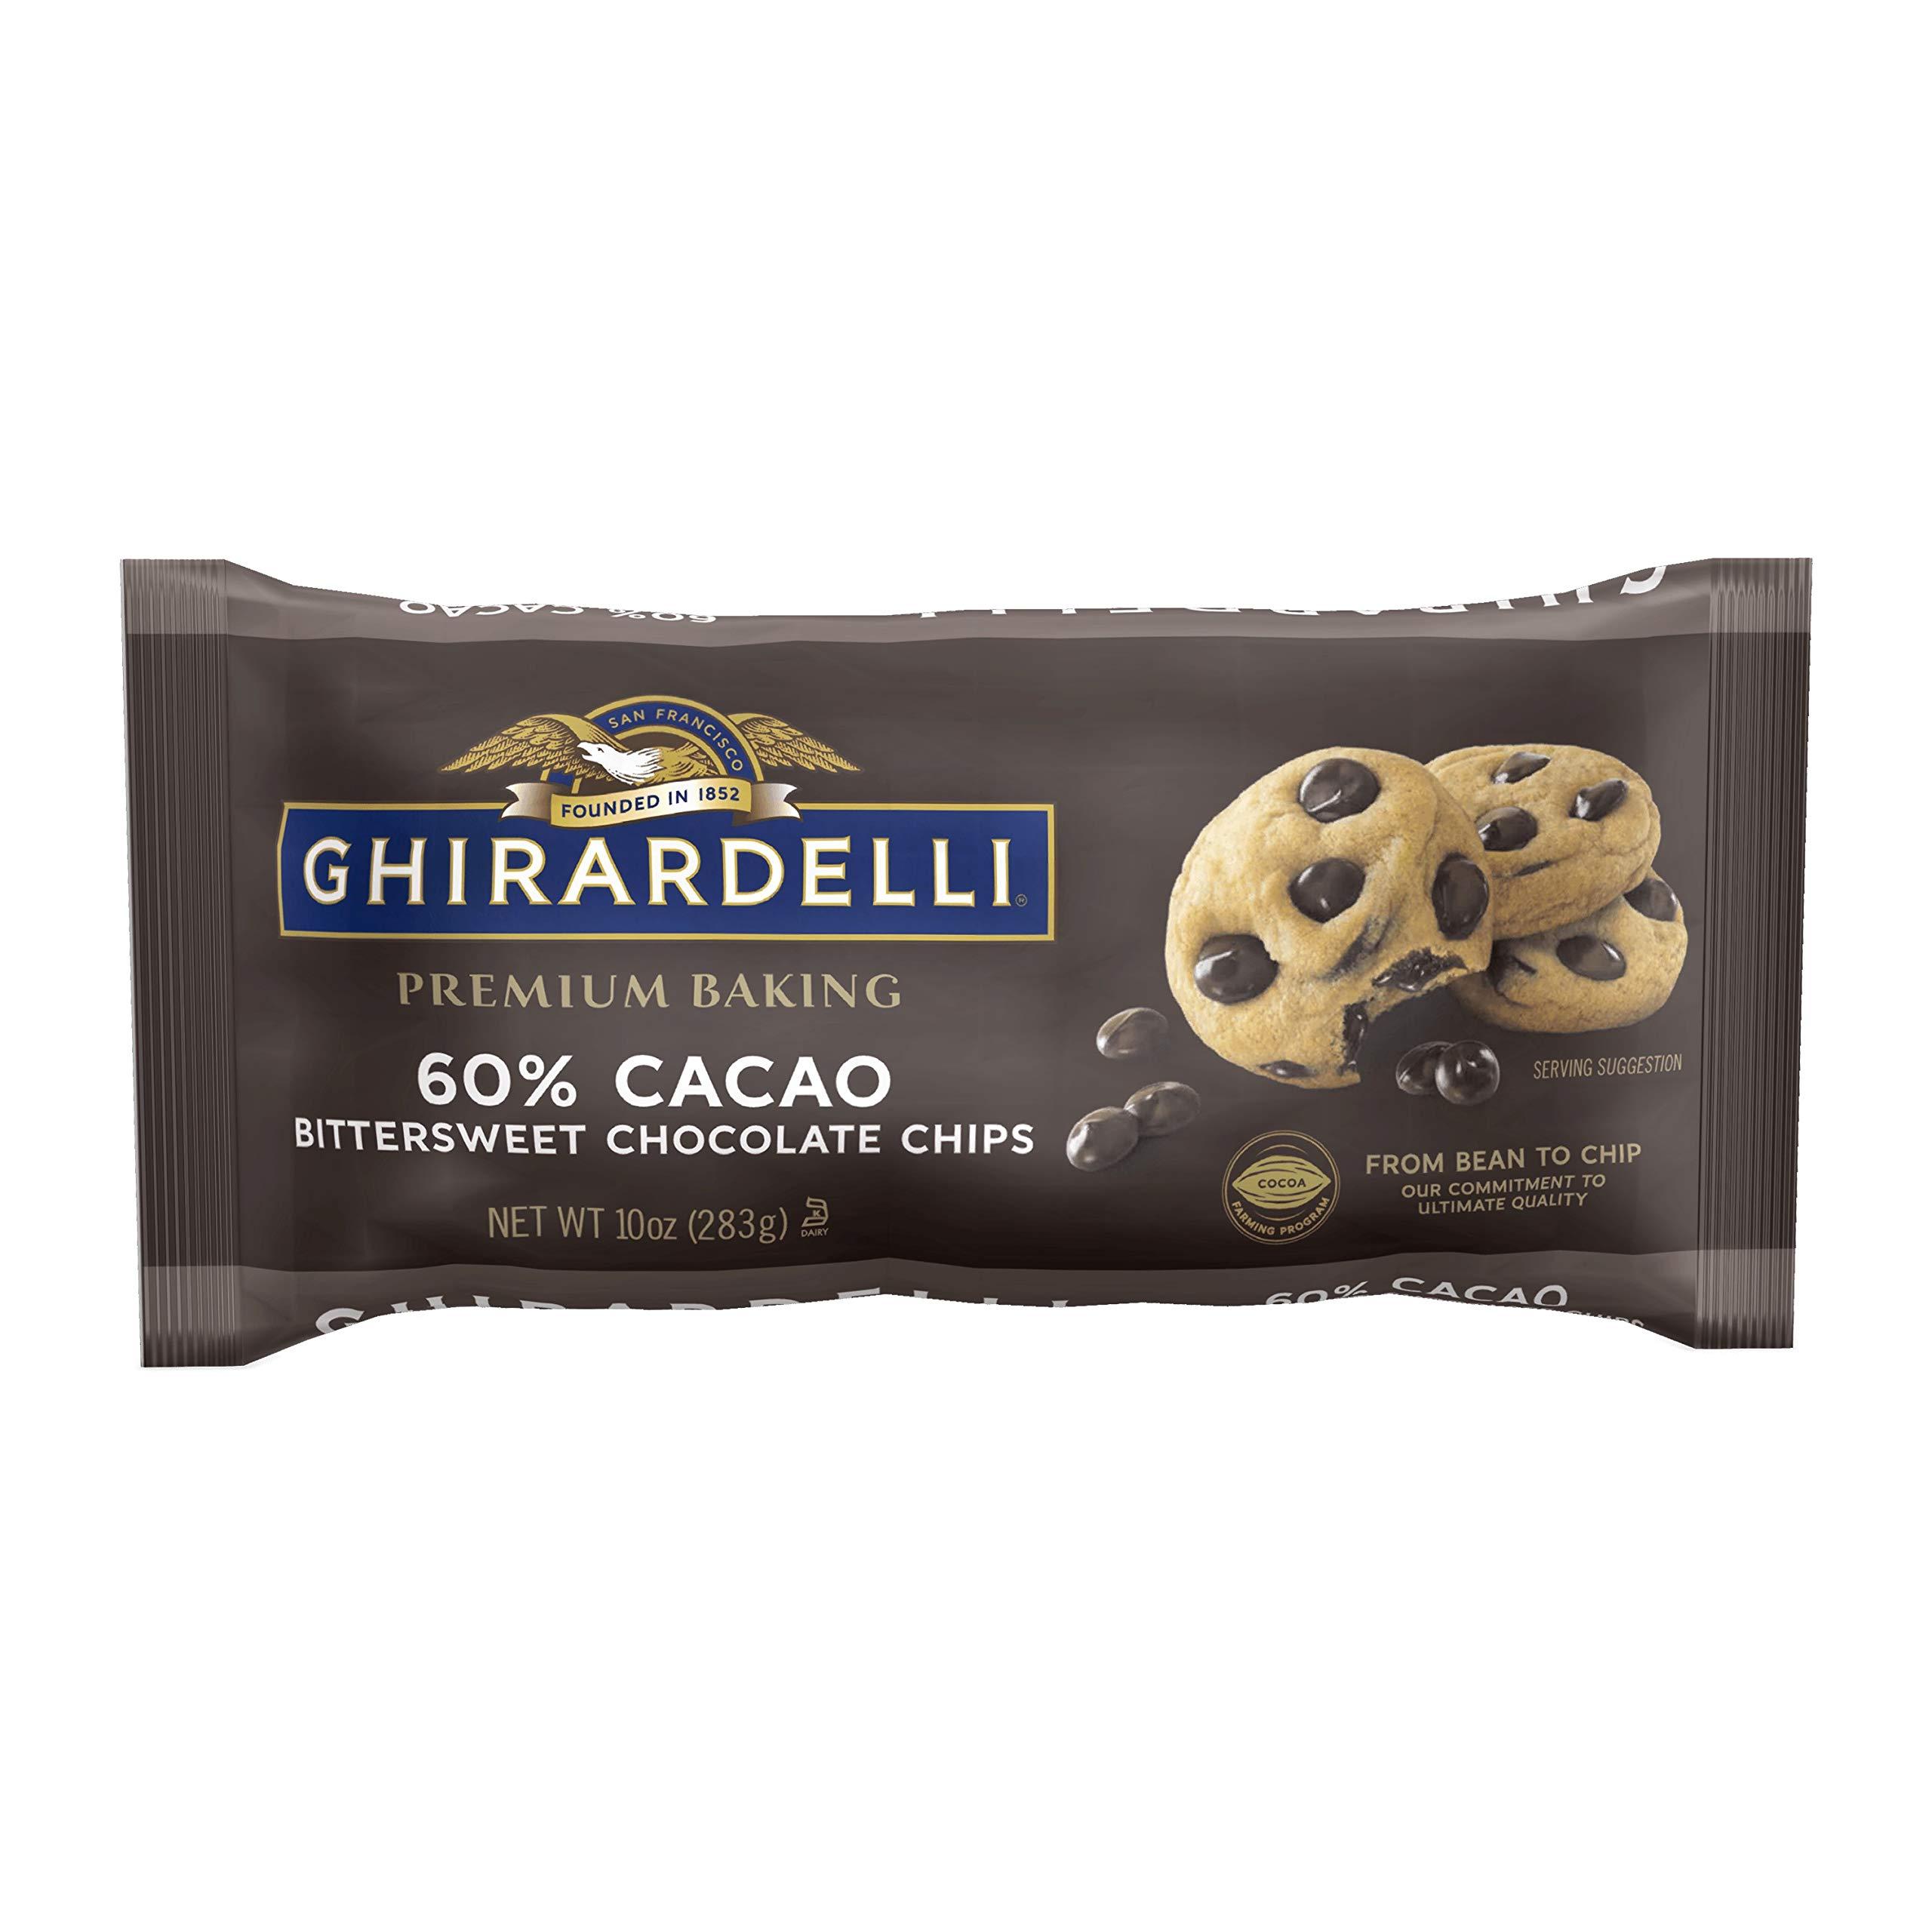 Ghirardelli Chocolate Baking Chips, Bittersweet Chocolate, 10 oz.,(Pack of 6)